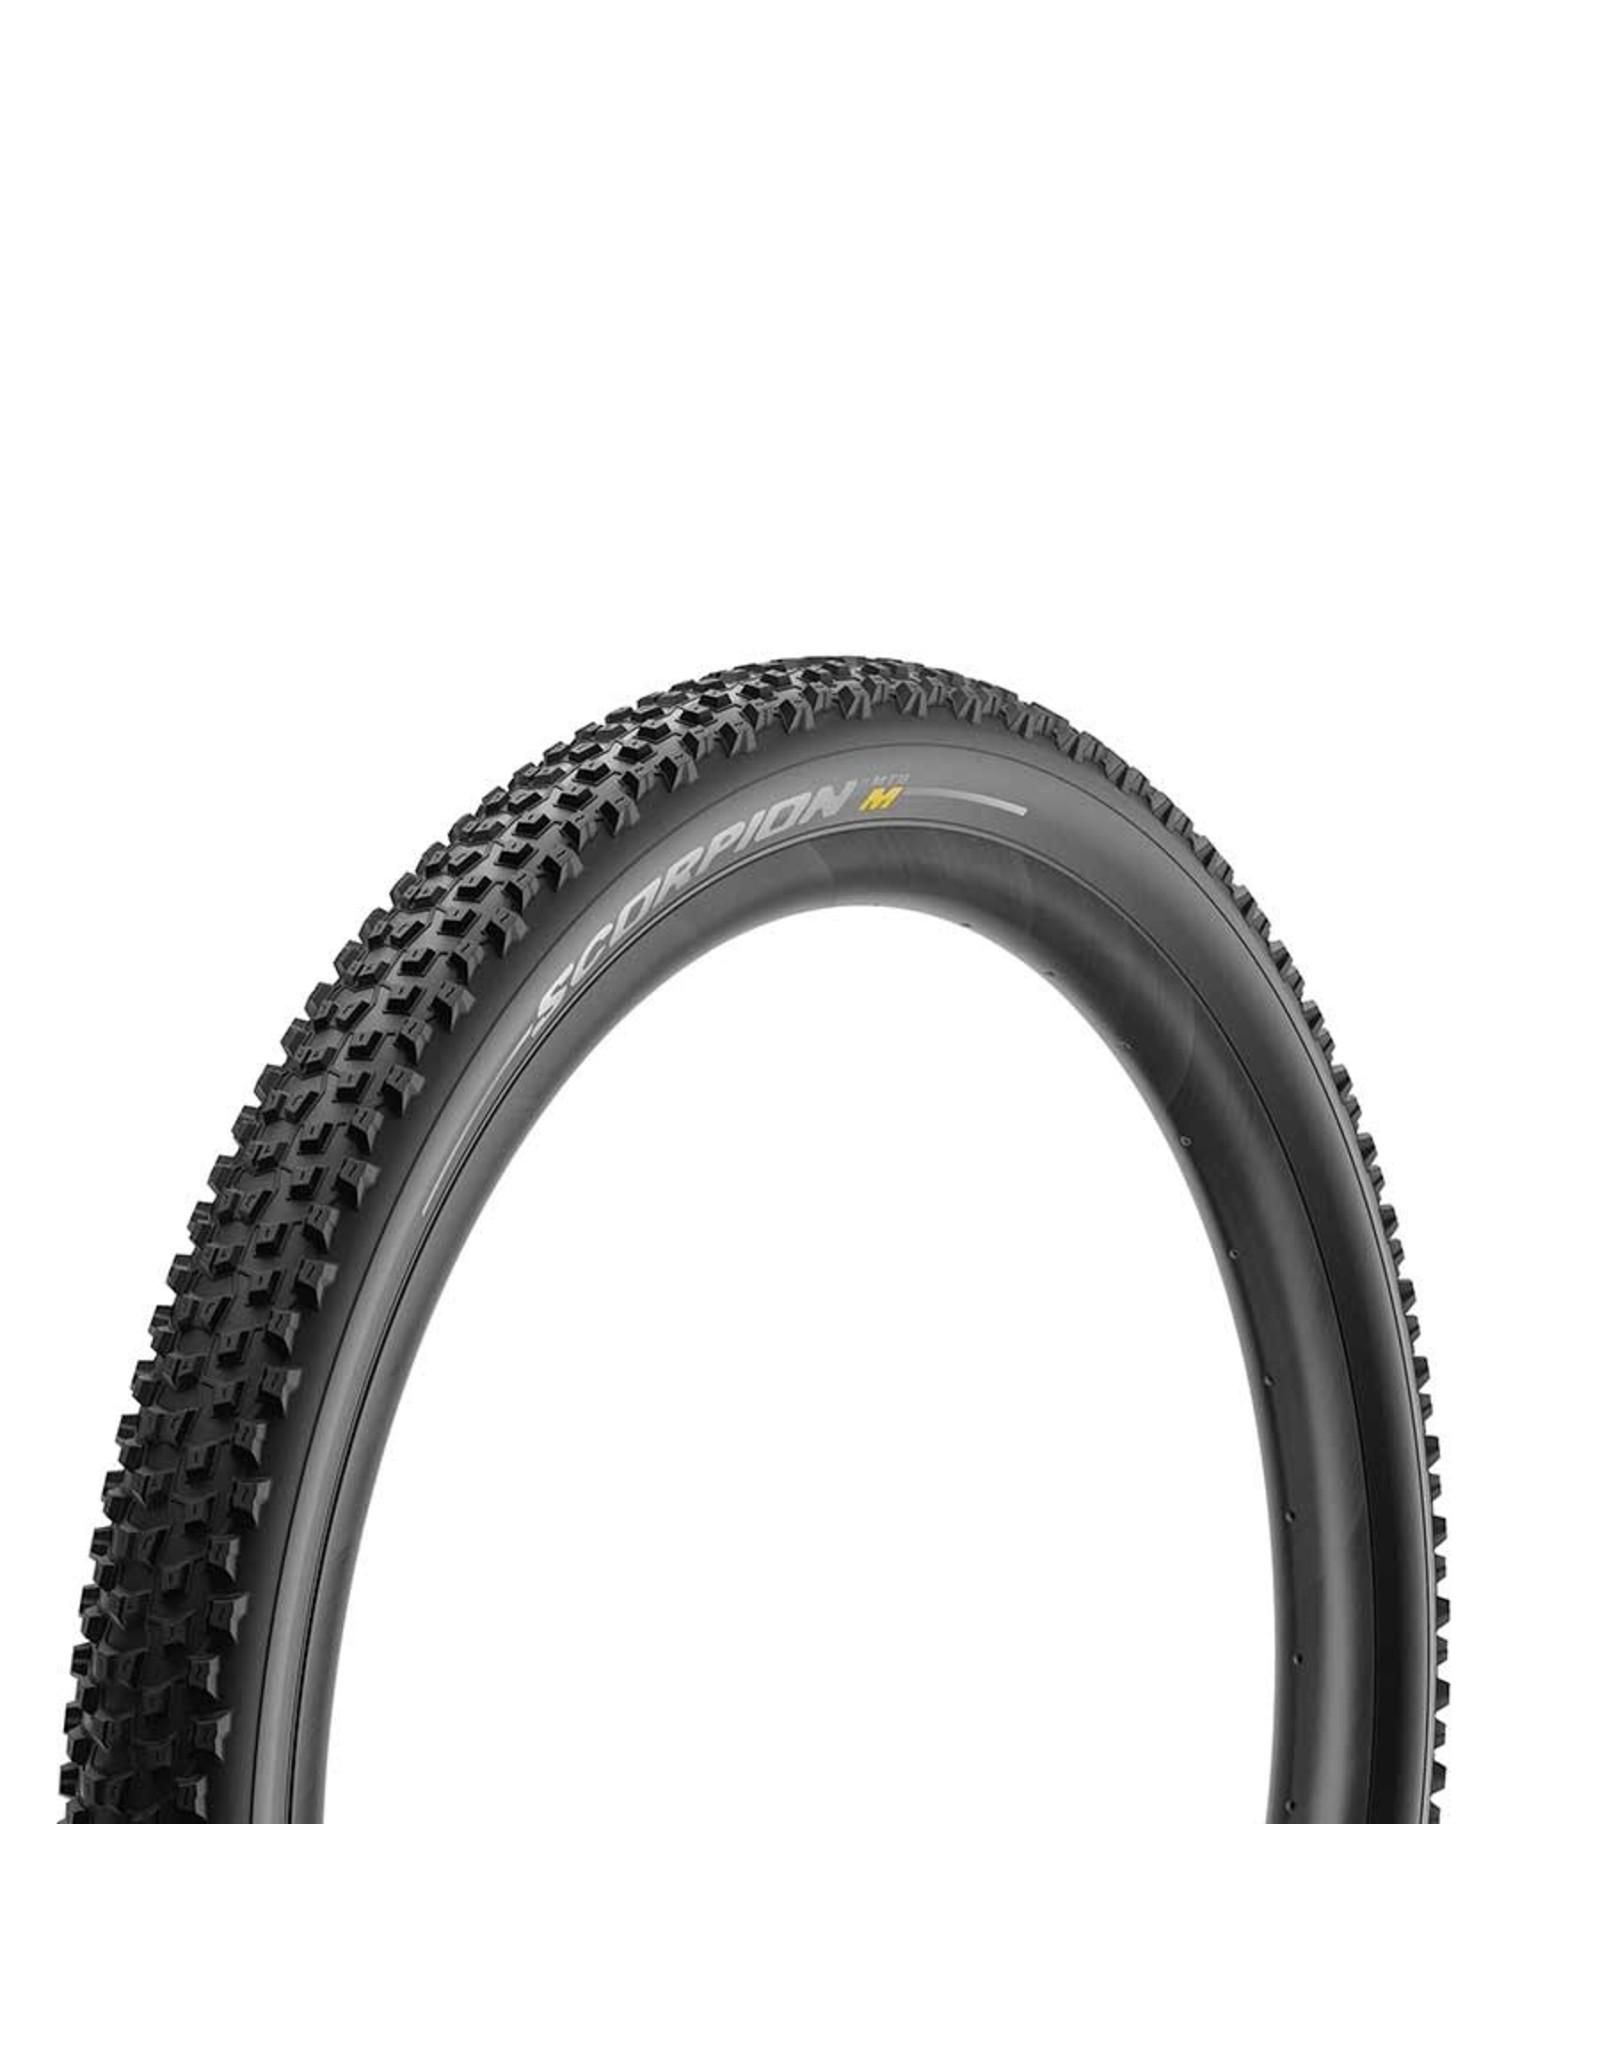 Pirelli Pirelli, Scorpion MTB M, Tire, 27.5''x2.40, Folding, Tubeless Ready, Smartgrip, Hyperwall, 127TPI, Black